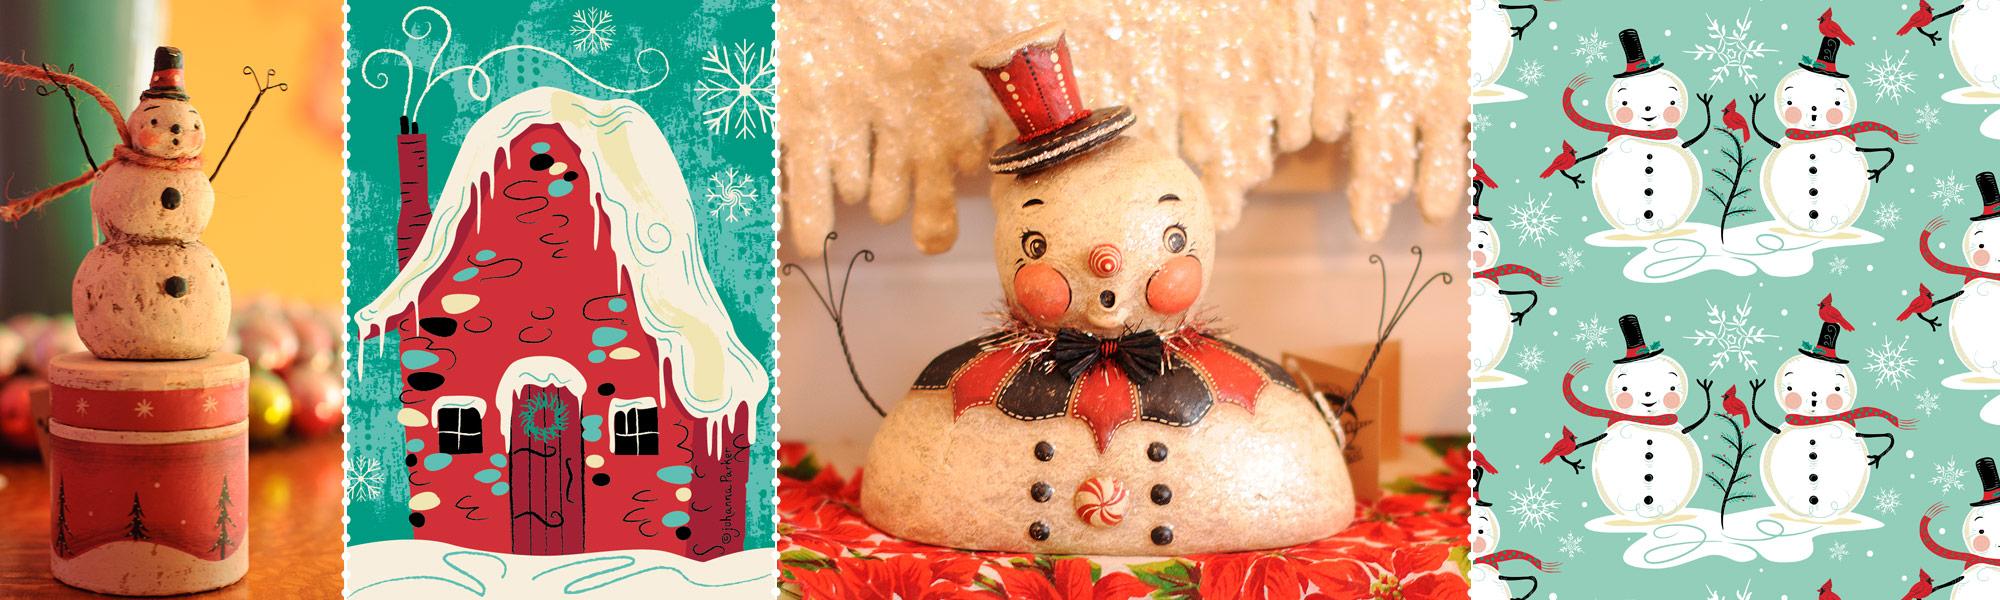 Johanna-Parker-Christmas-Banner-1.jpg